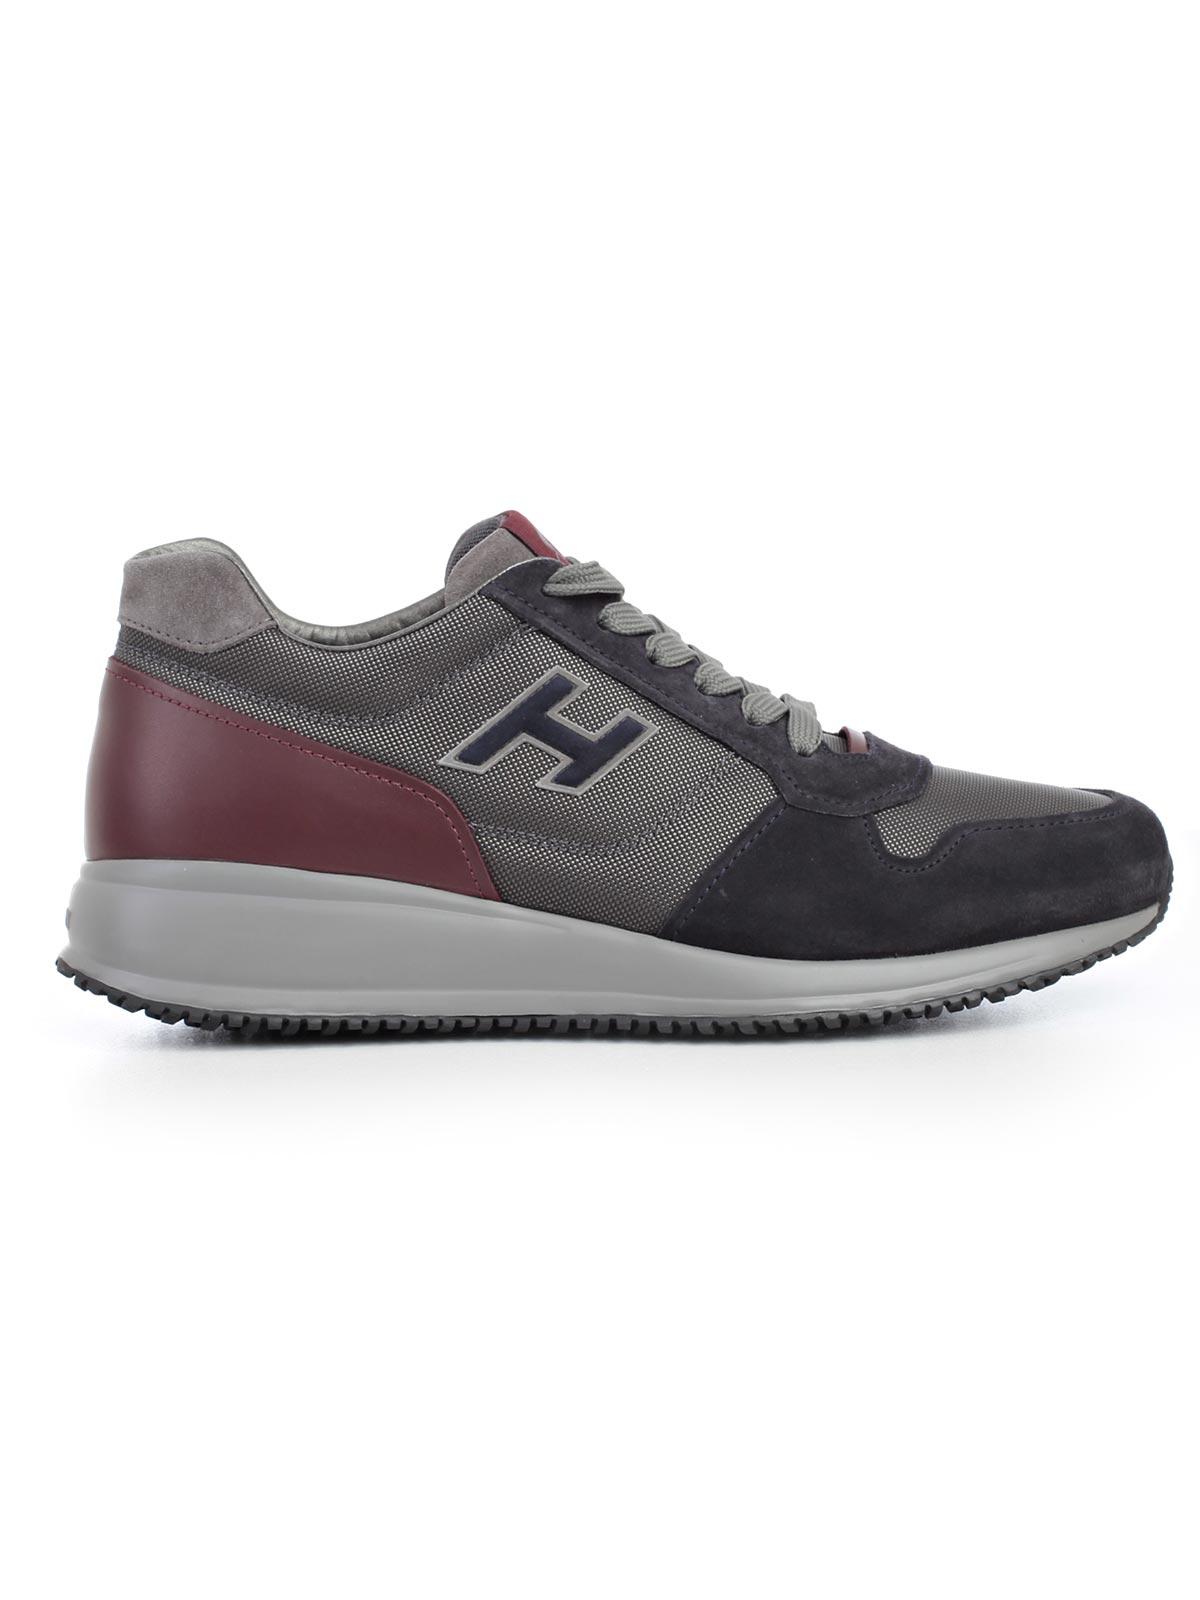 Picture of HOGAN FOOTWEAR SCARPA NEW INTERACTIVE N20